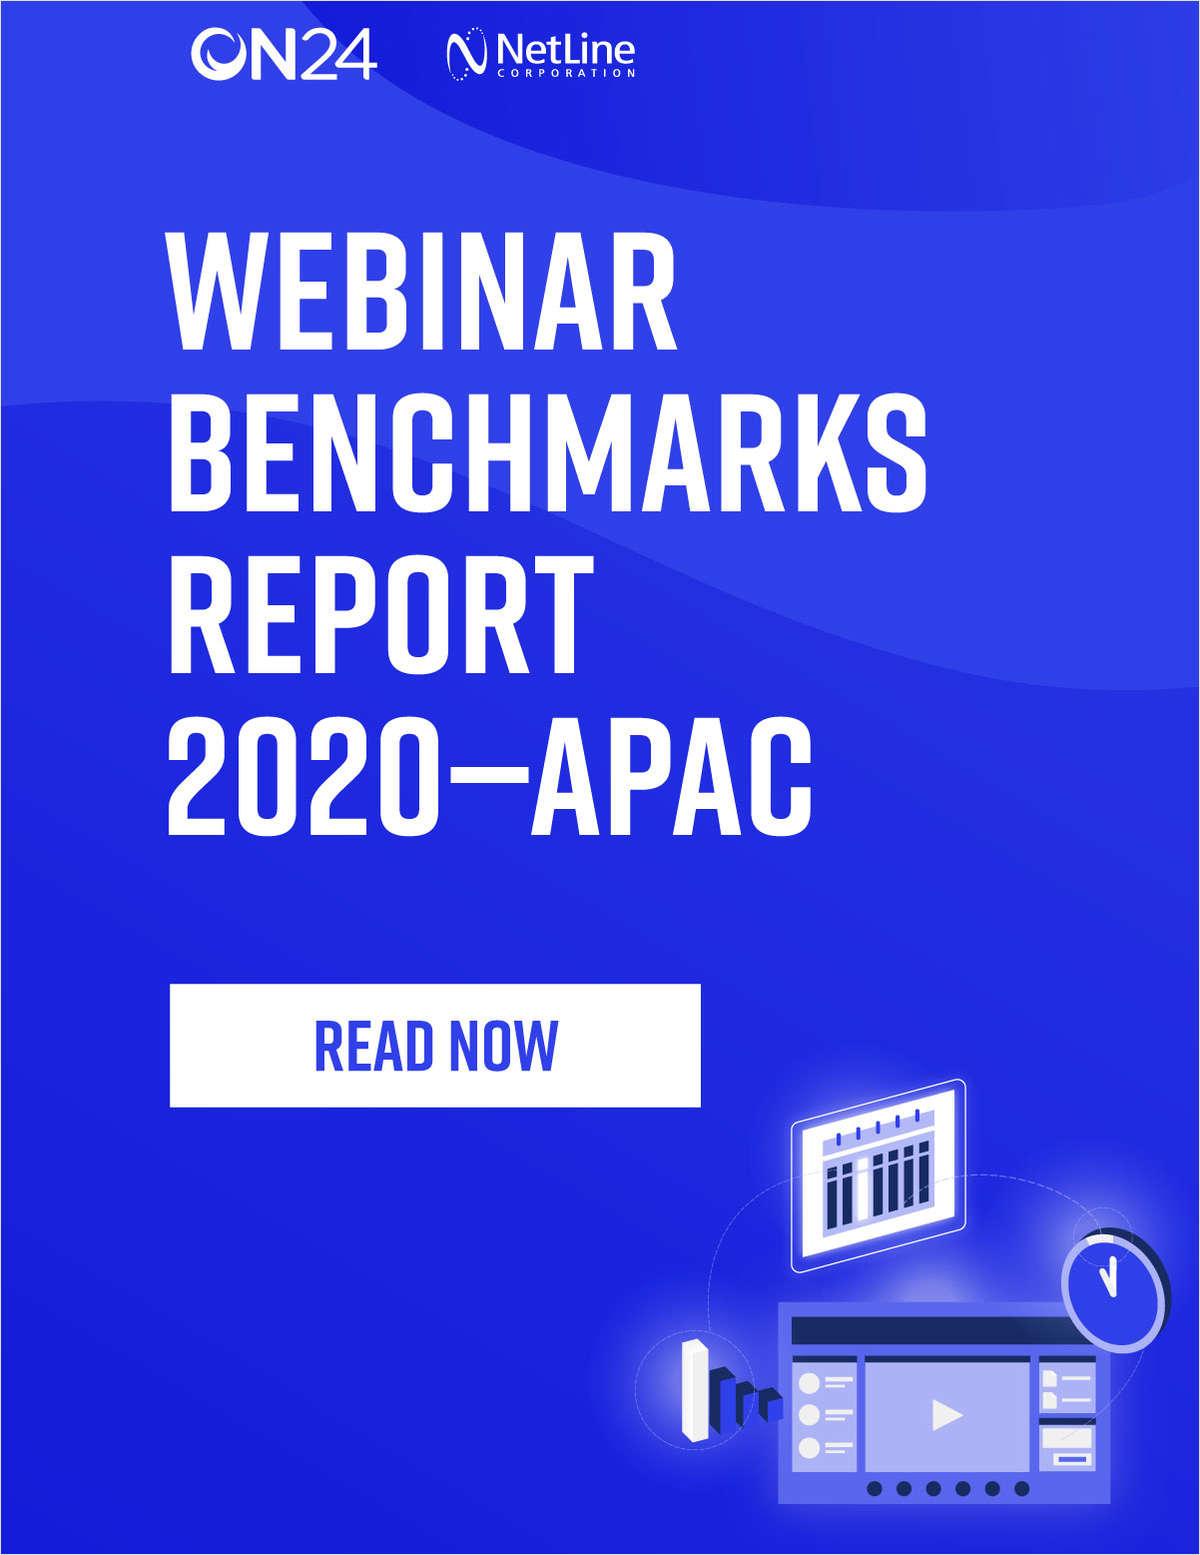 Webinar Benchmarks Report 2020 - APAC